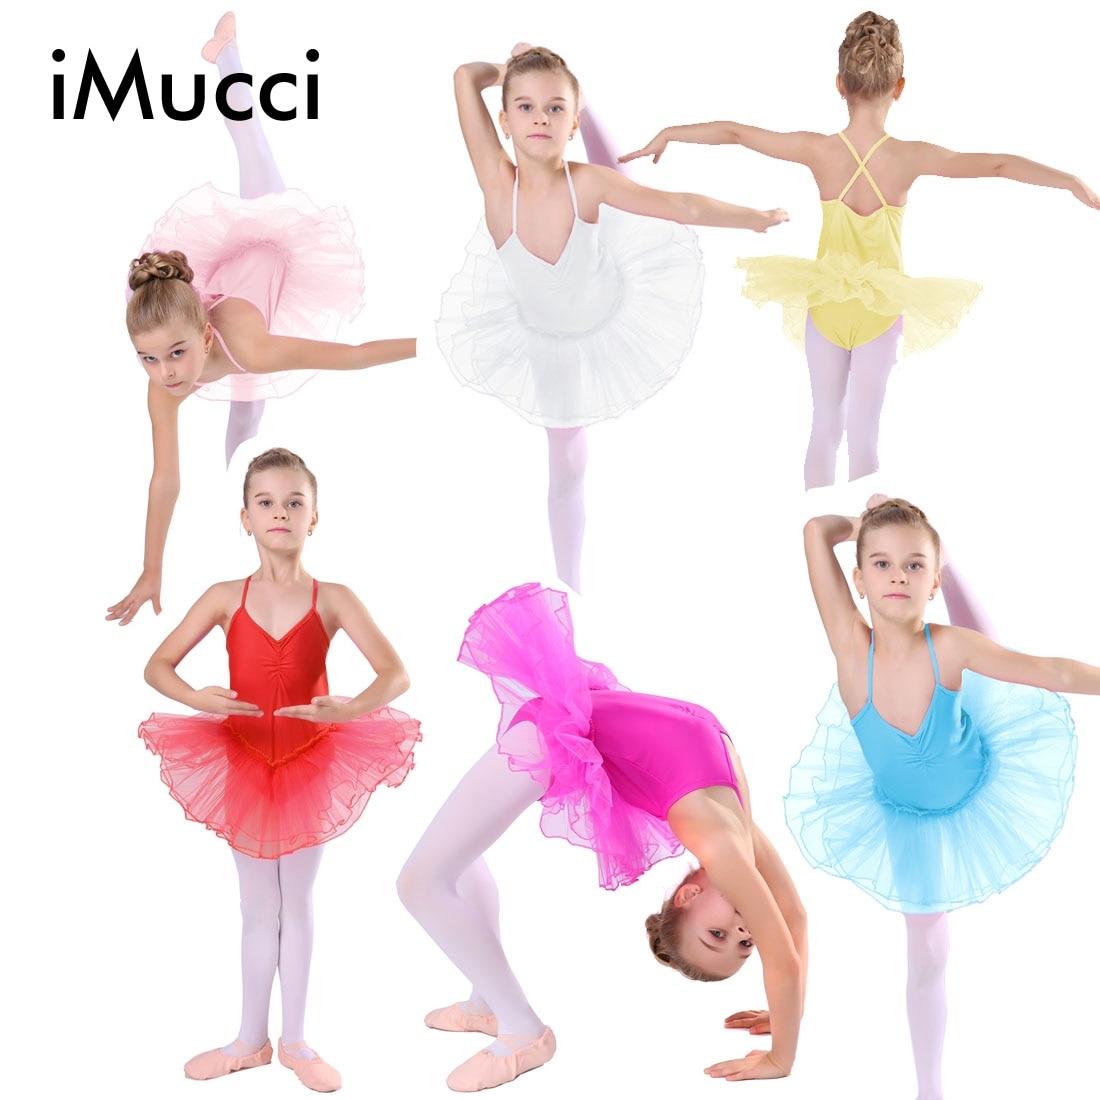 b6860d59d3 iMucci 7 Colors Rose Girl Ballet Dress Child Gauze Gymnastics Leotard Girls  Kids Gown Professional Tutus Dance Leotard Costume